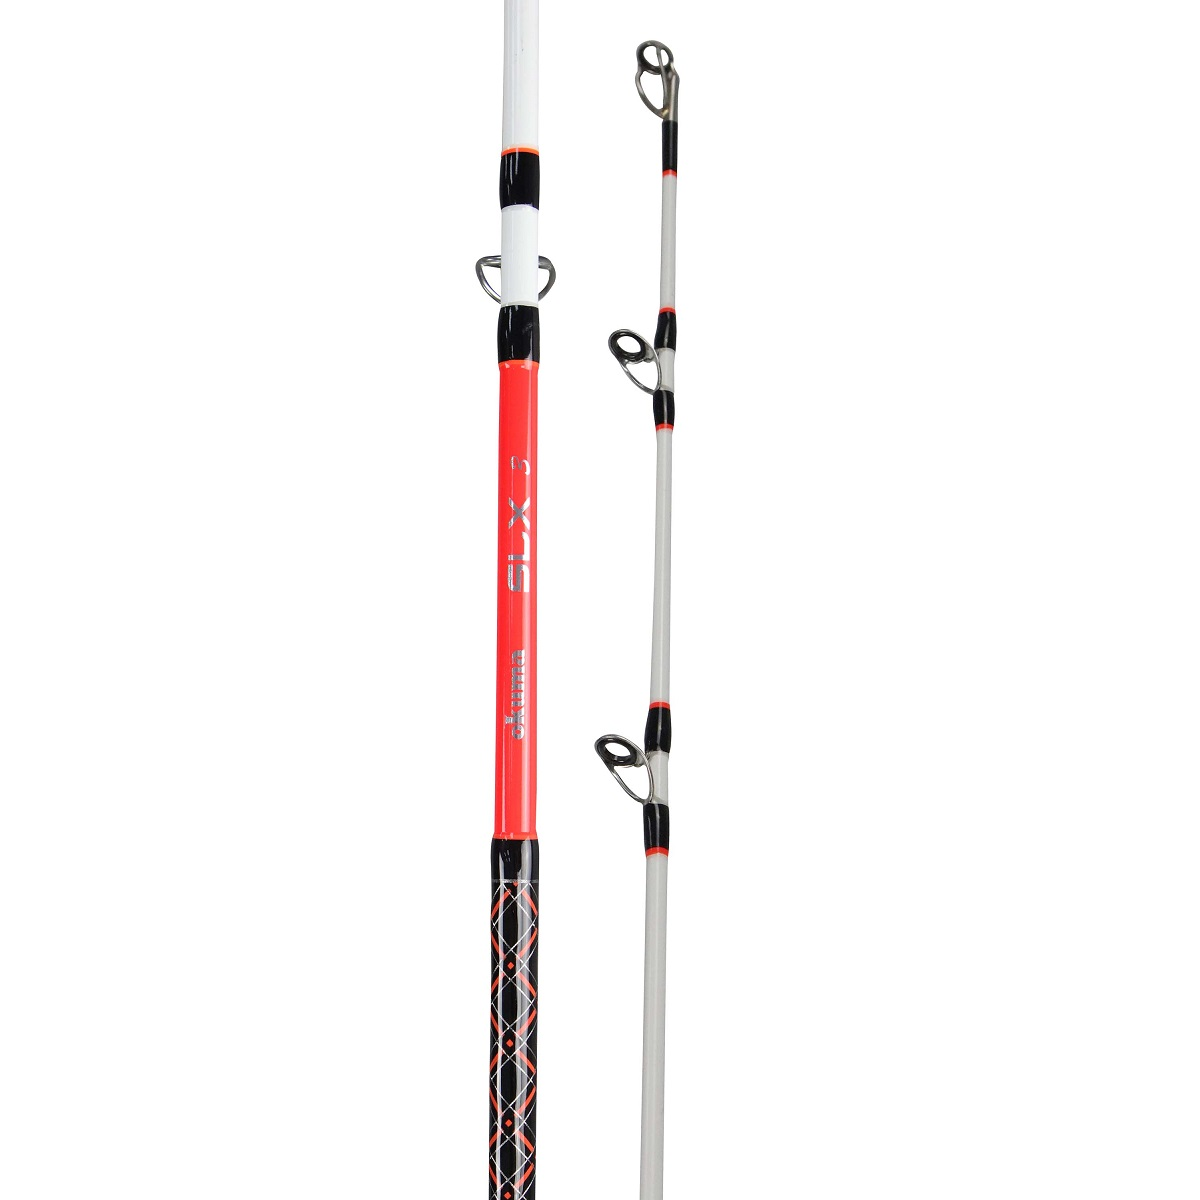 SLX Rod (2018 NEW) - SLX Rod